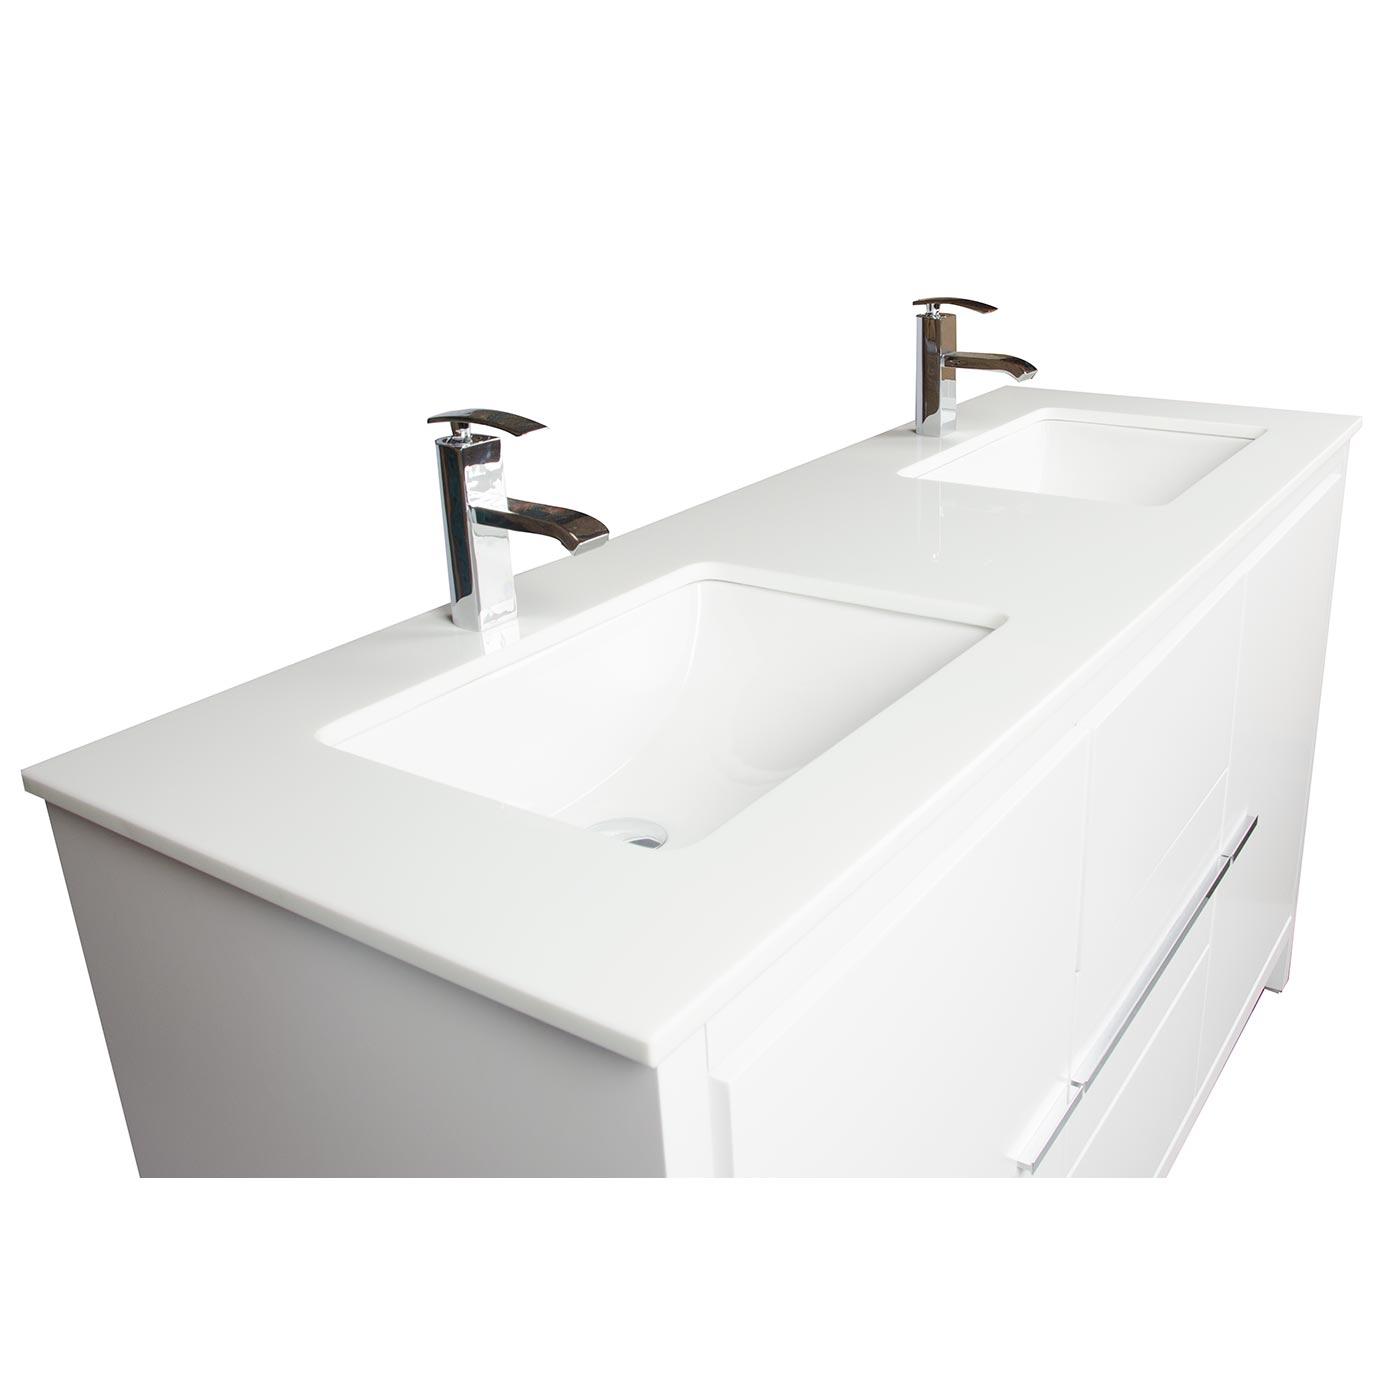 CBI Enna  Inch Modern Bathroom Vanity In Metalic Grey TNLAMG - White modern bathroom vanity